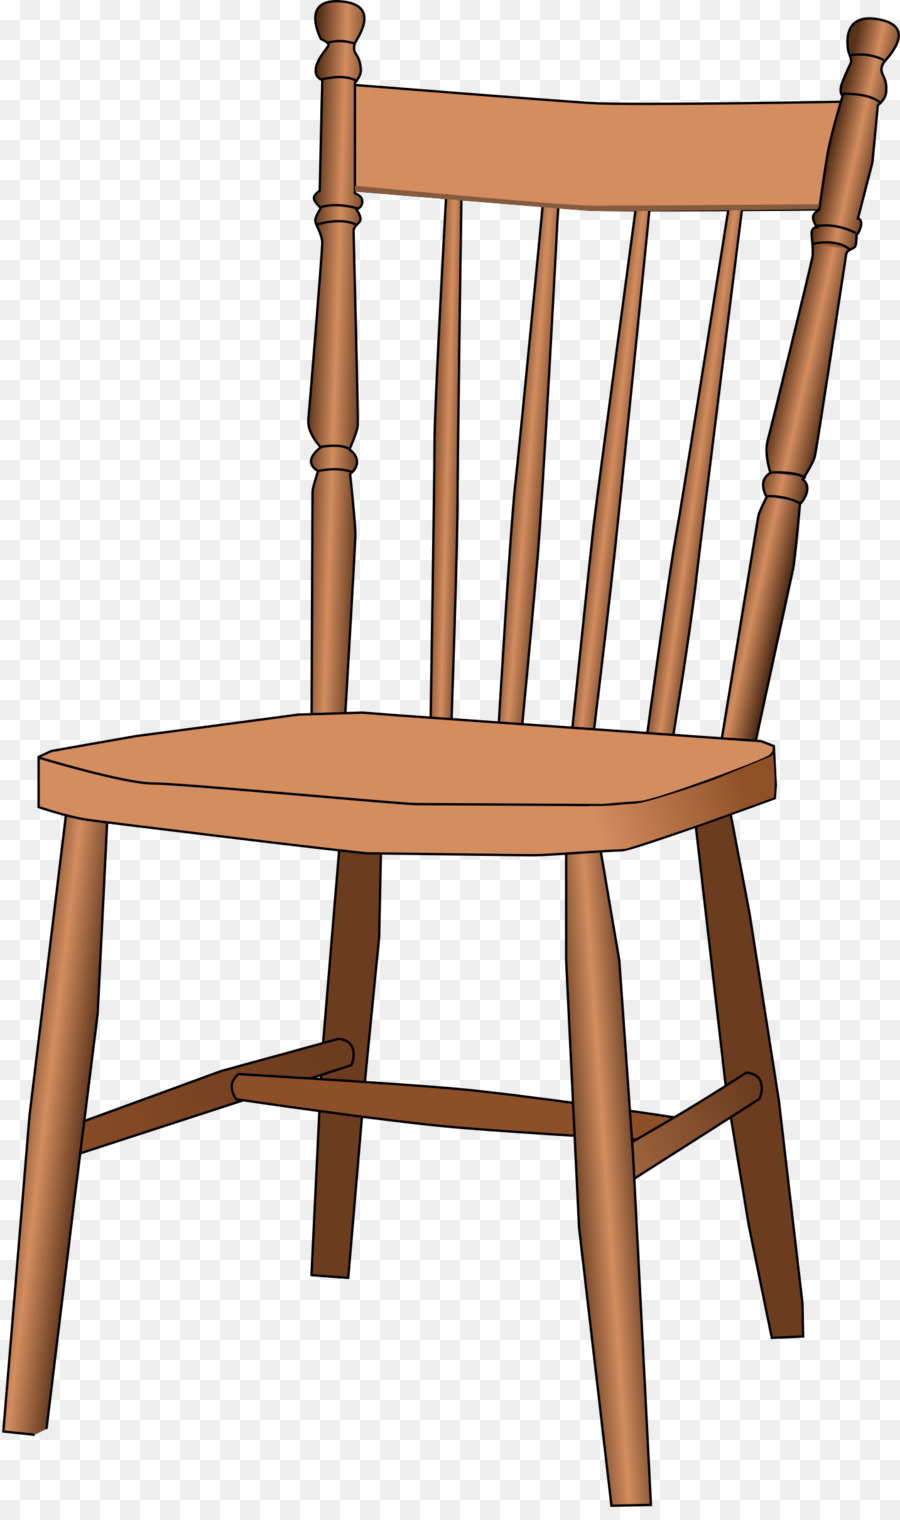 Clipart chair cartoon. Wood table transparent clip